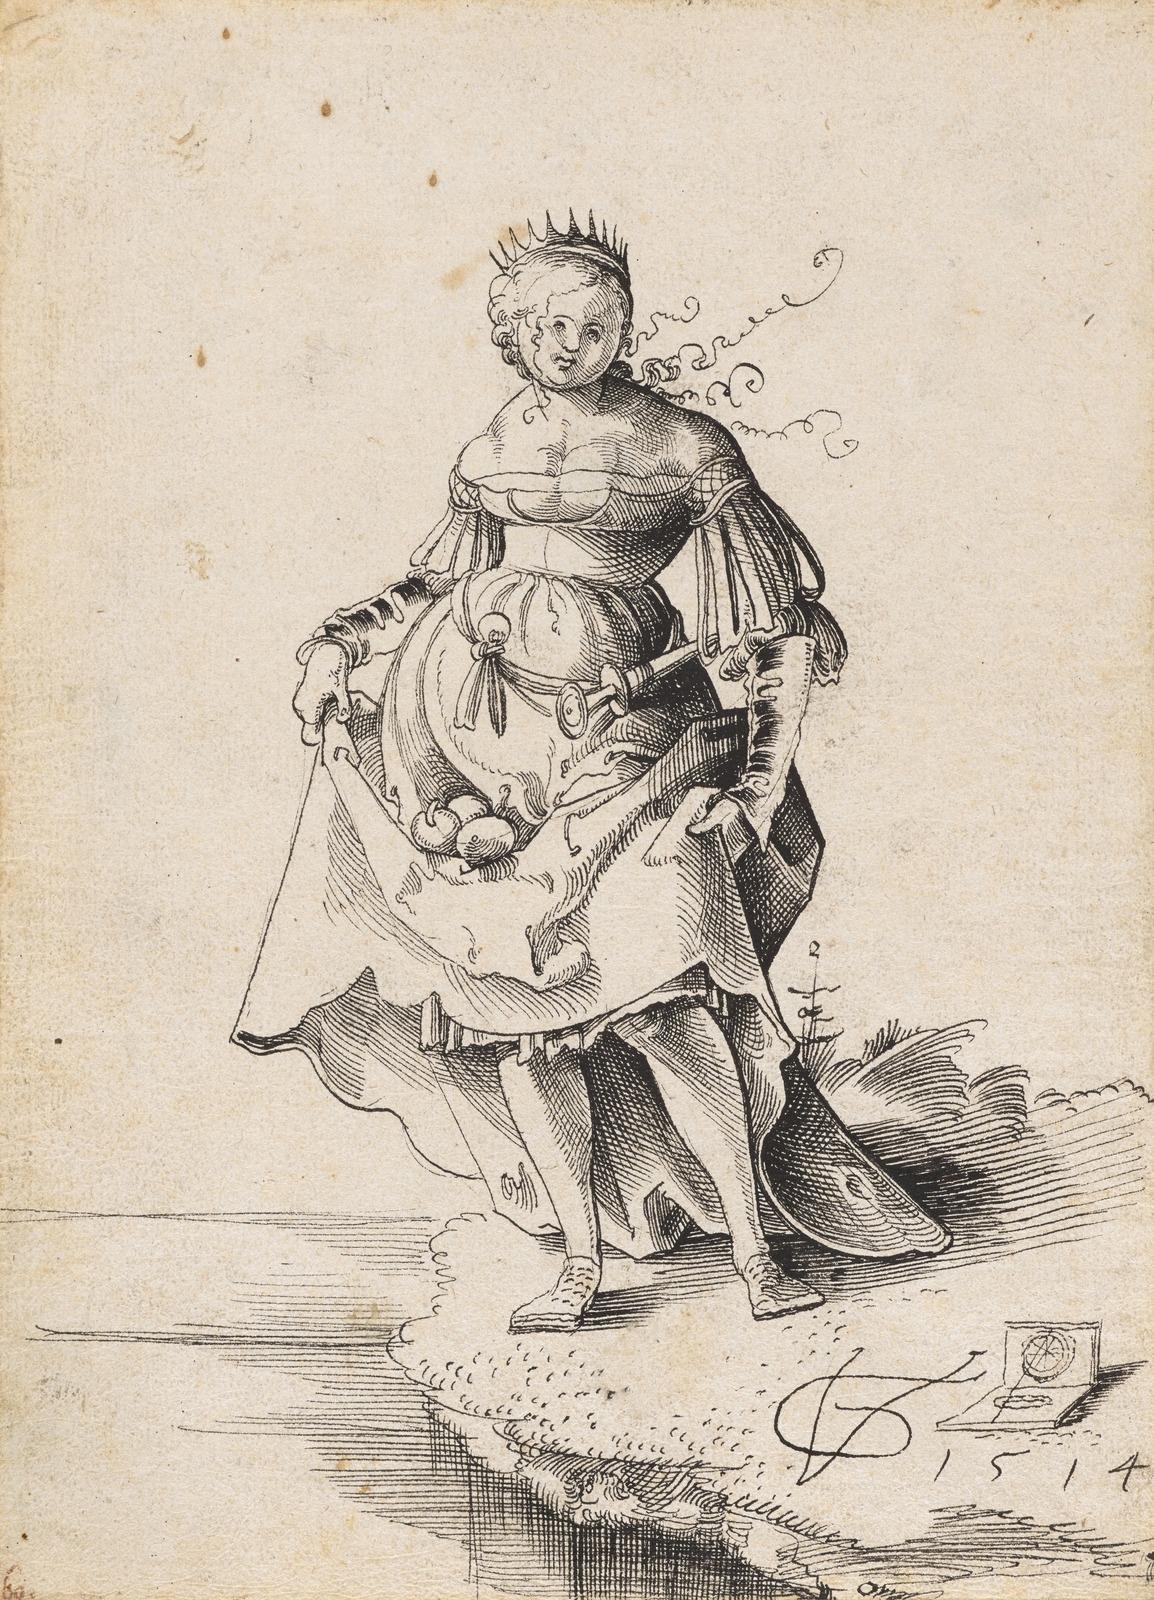 Коронованная девушка, несущая яблоки в юбке (Crowned girl, carrying apples in the skirt)_21.6 х 15.5_бумага, перо черным тоном_Базель, Кунстмузеум.jpg